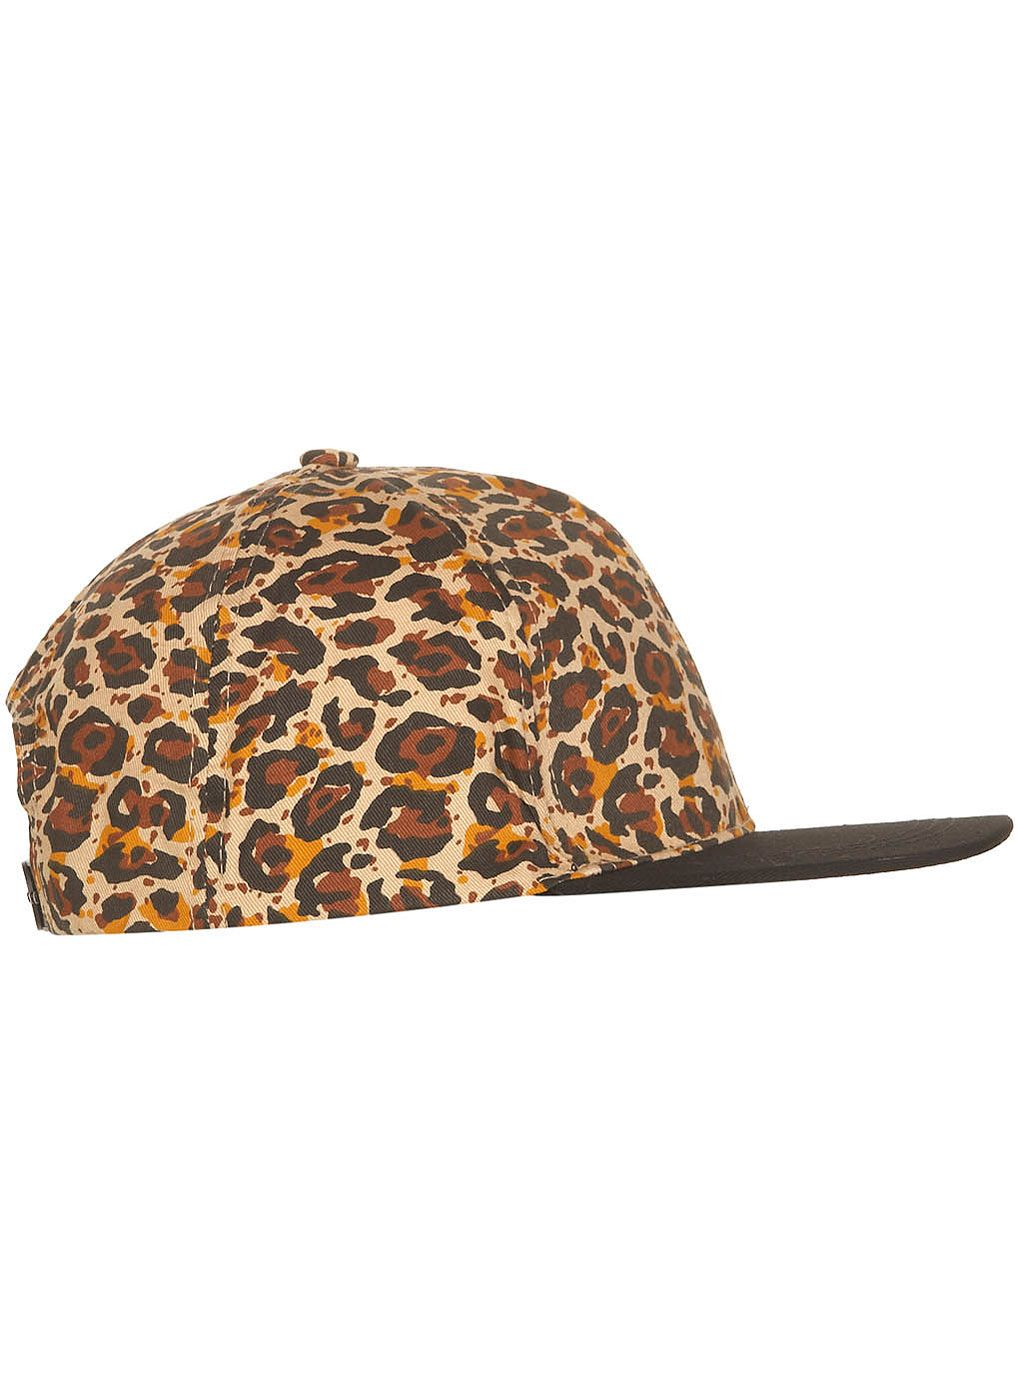 Black Animal Print Snapback - Hats - Accessories - TOPMAN